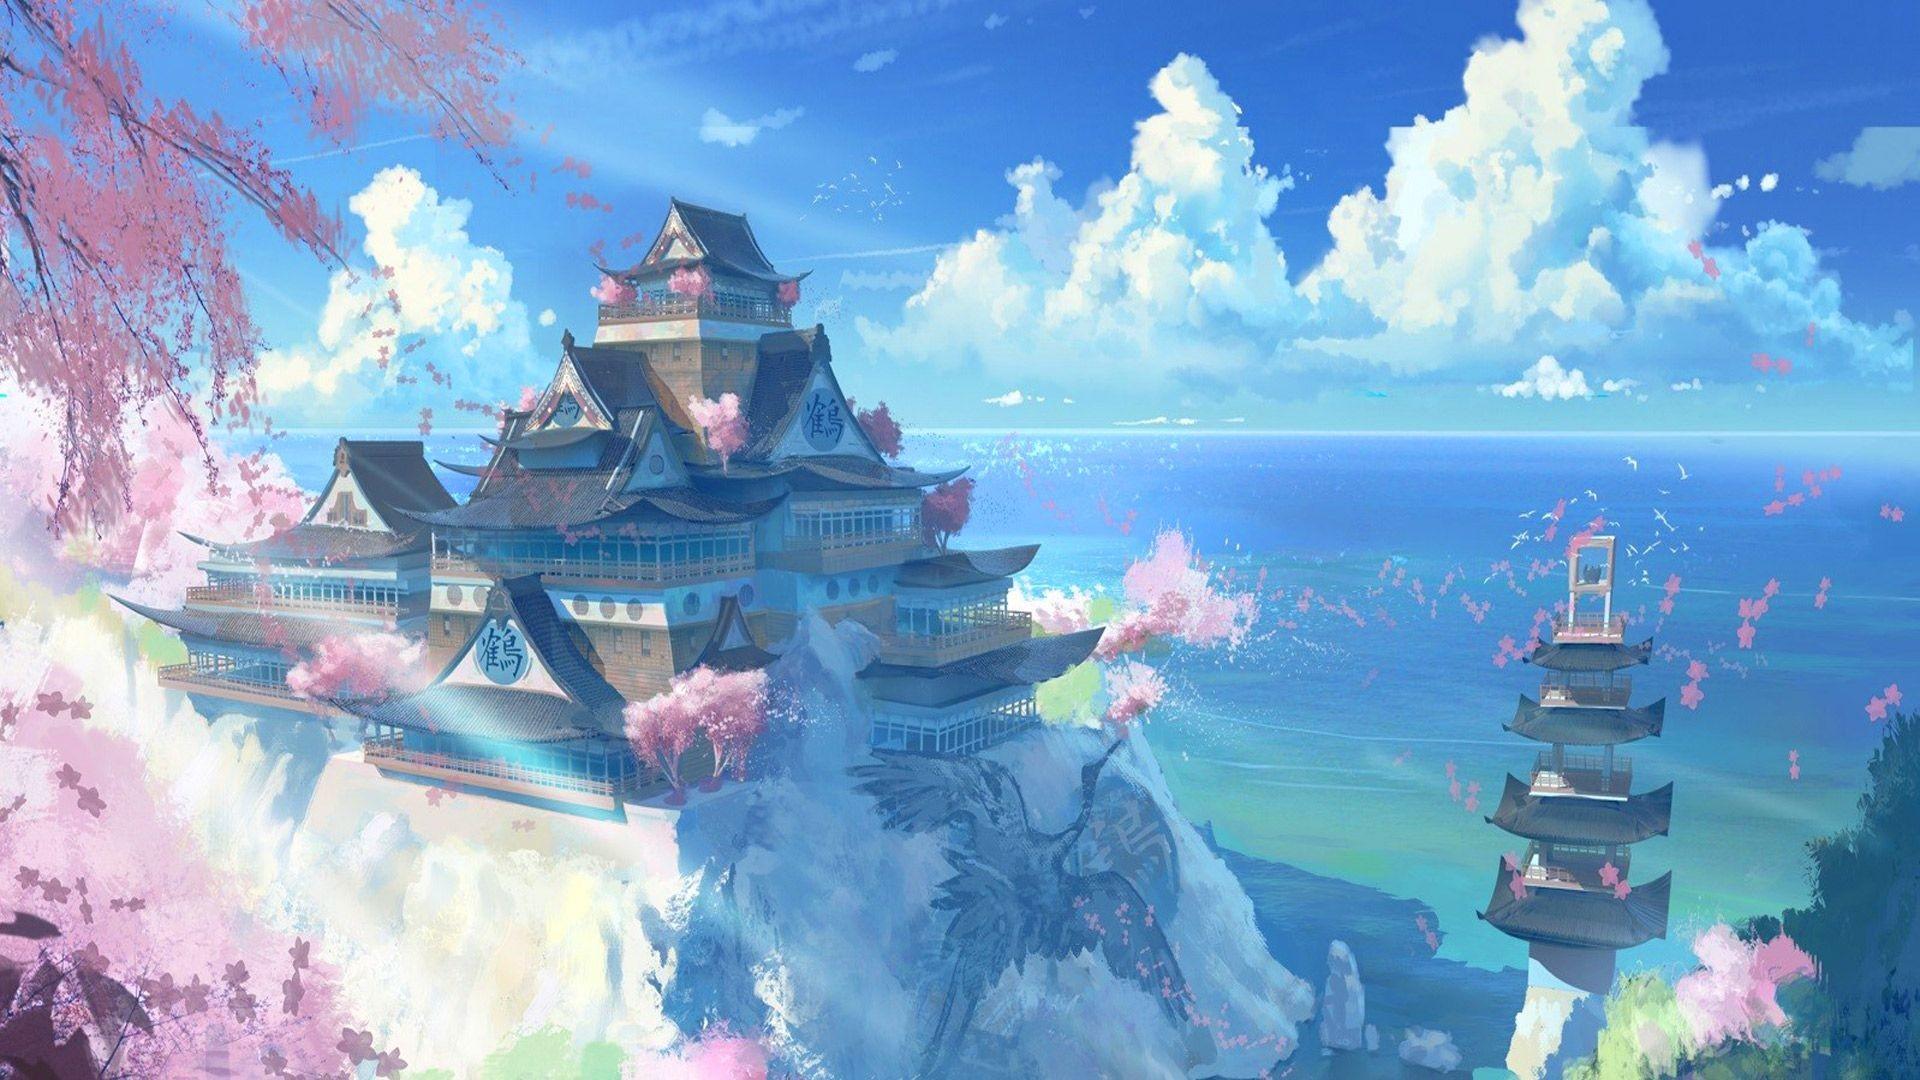 1920x1080, Free Japan Temple Scenery Anime Manga, Computer - Japan Wallpaper Anime - HD Wallpaper